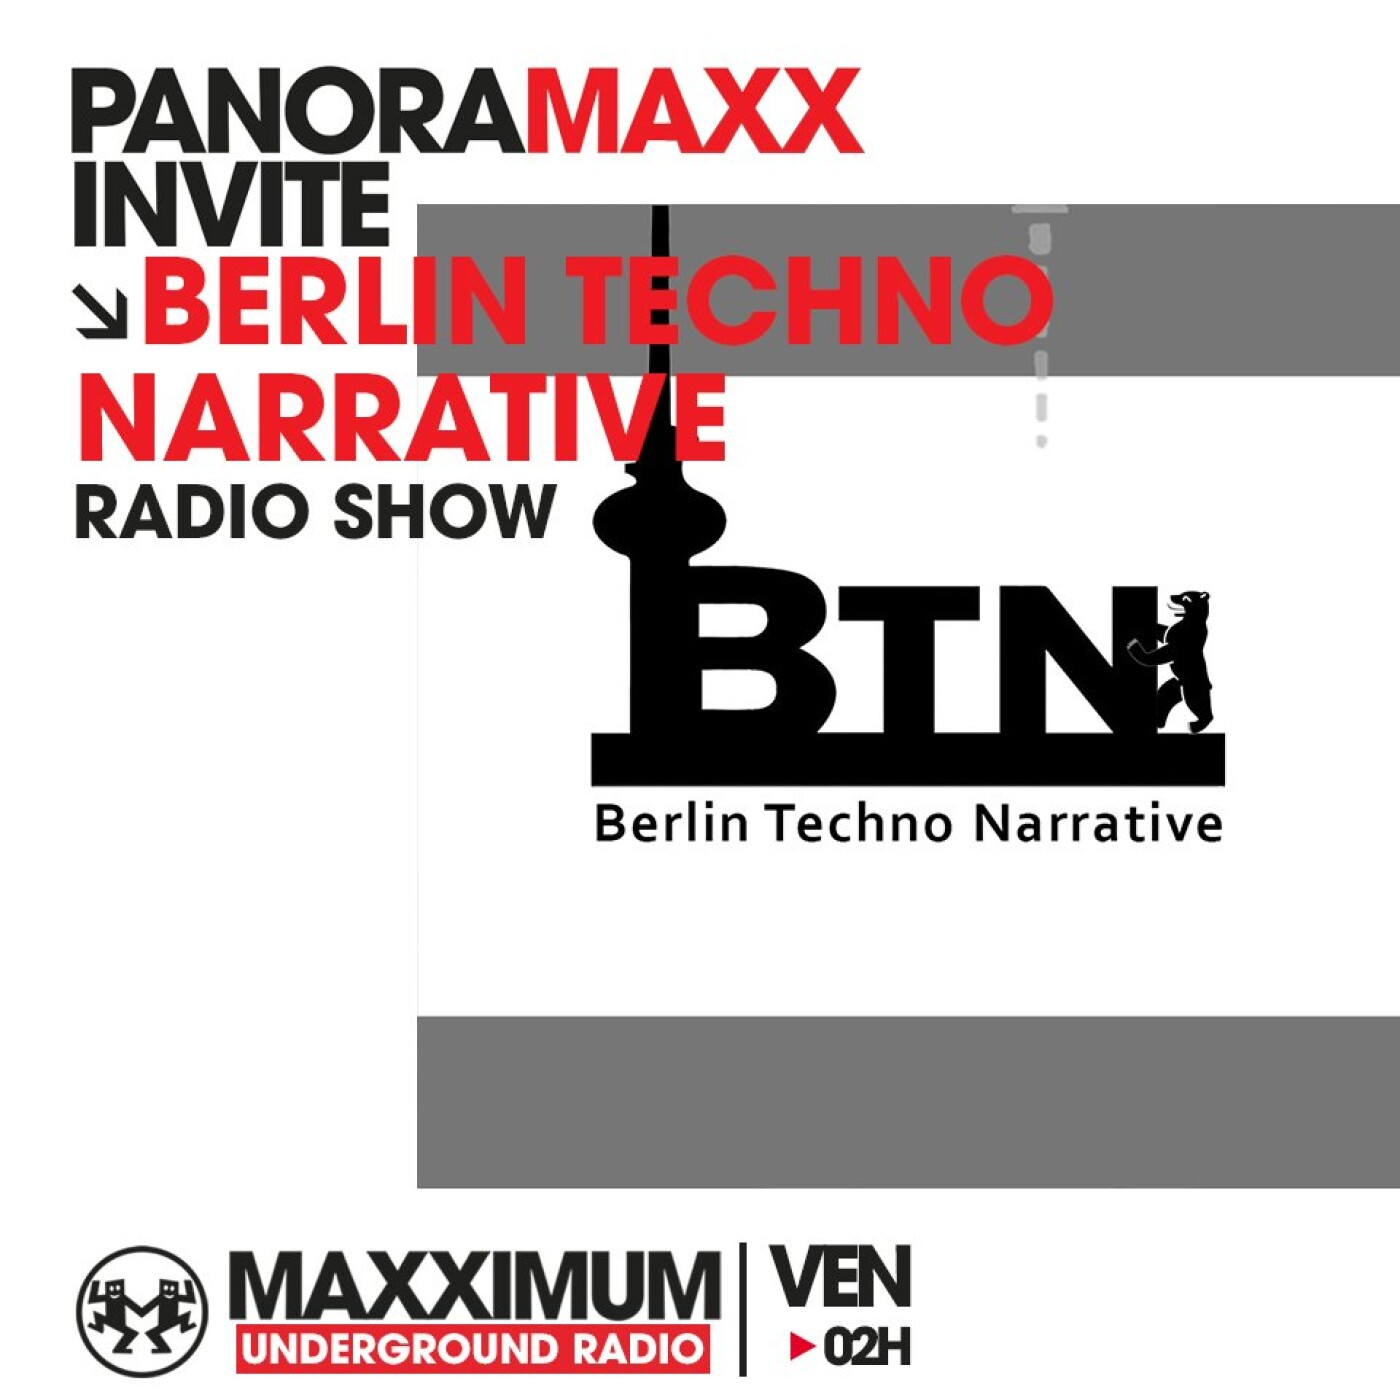 PANORAMAXX : BERLIN TECHNO NARRATIV